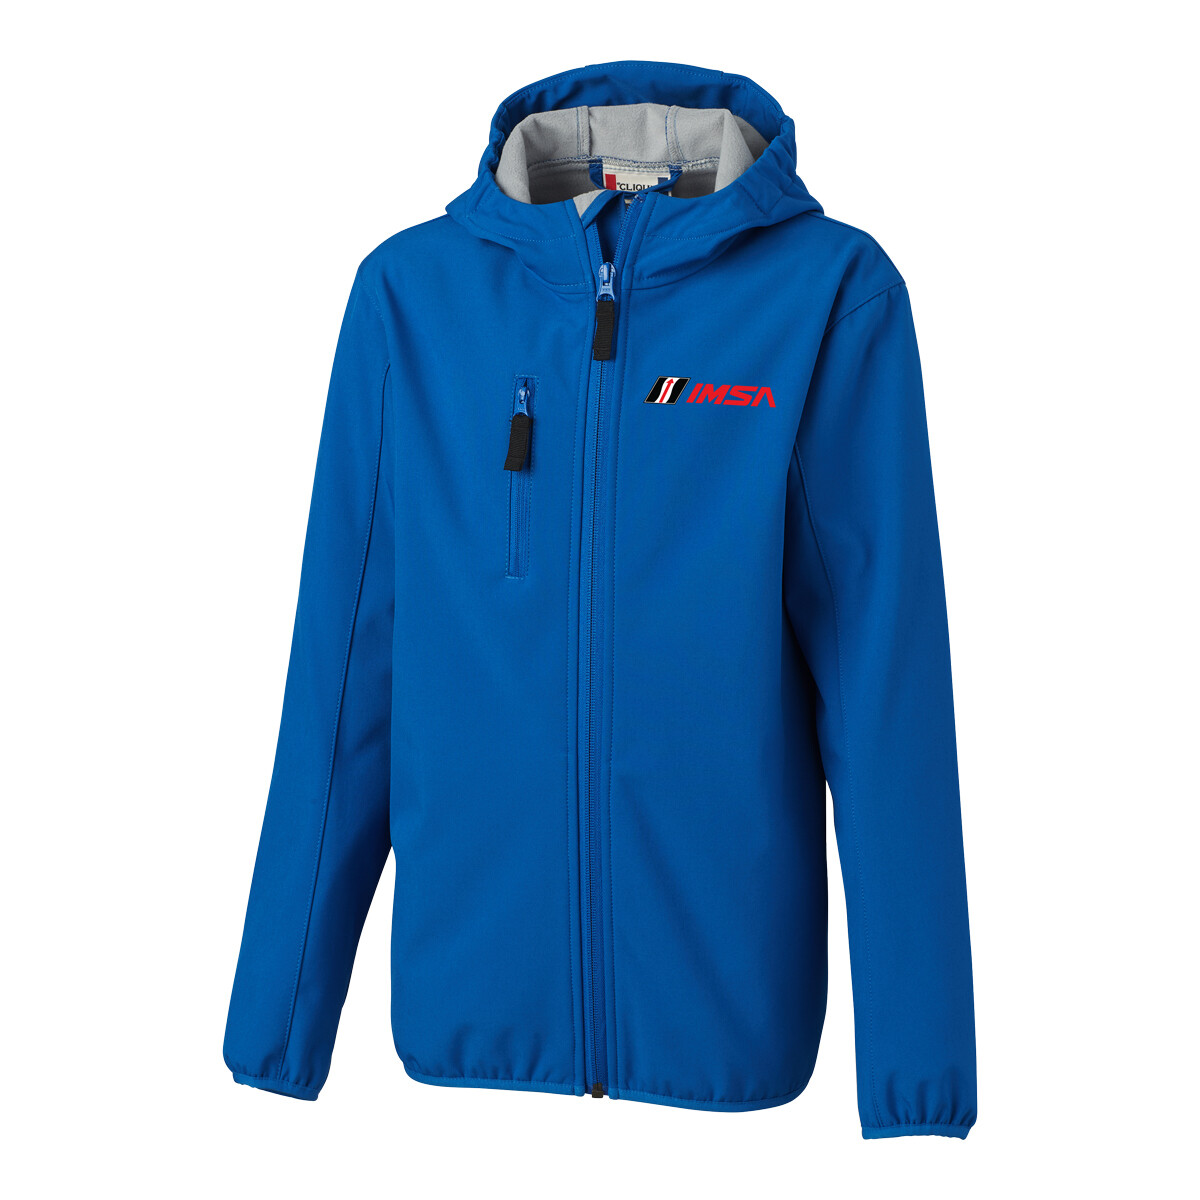 IMSA Youth Trail Jacket Blue